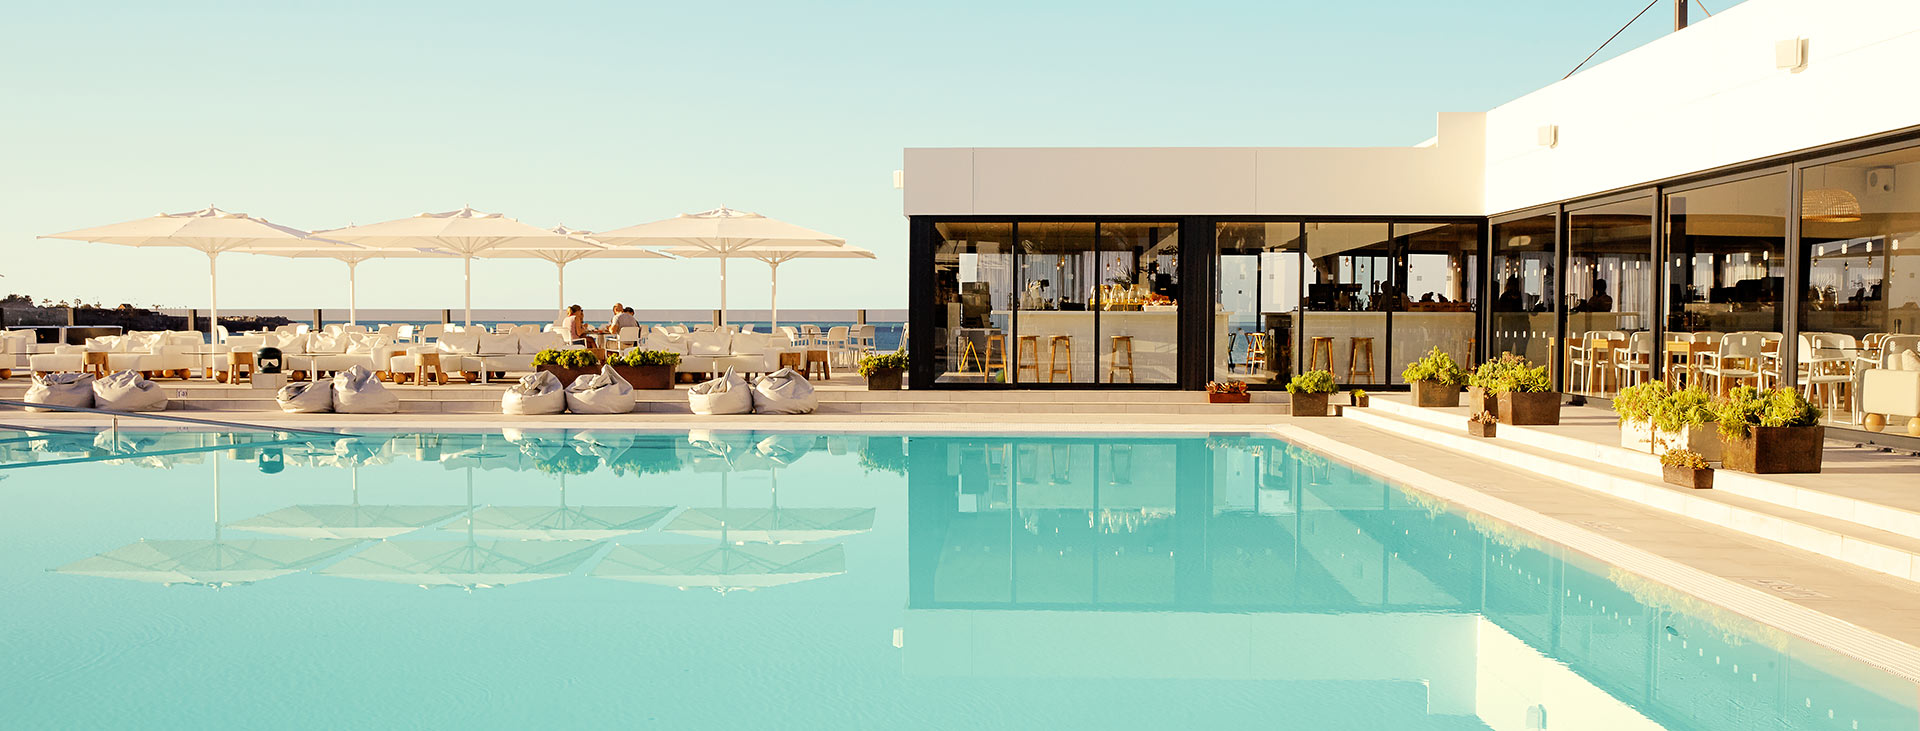 Ocean Beach Club - Gran Canaria, Playa del Cura, Gran Canaria, Kanariøyene